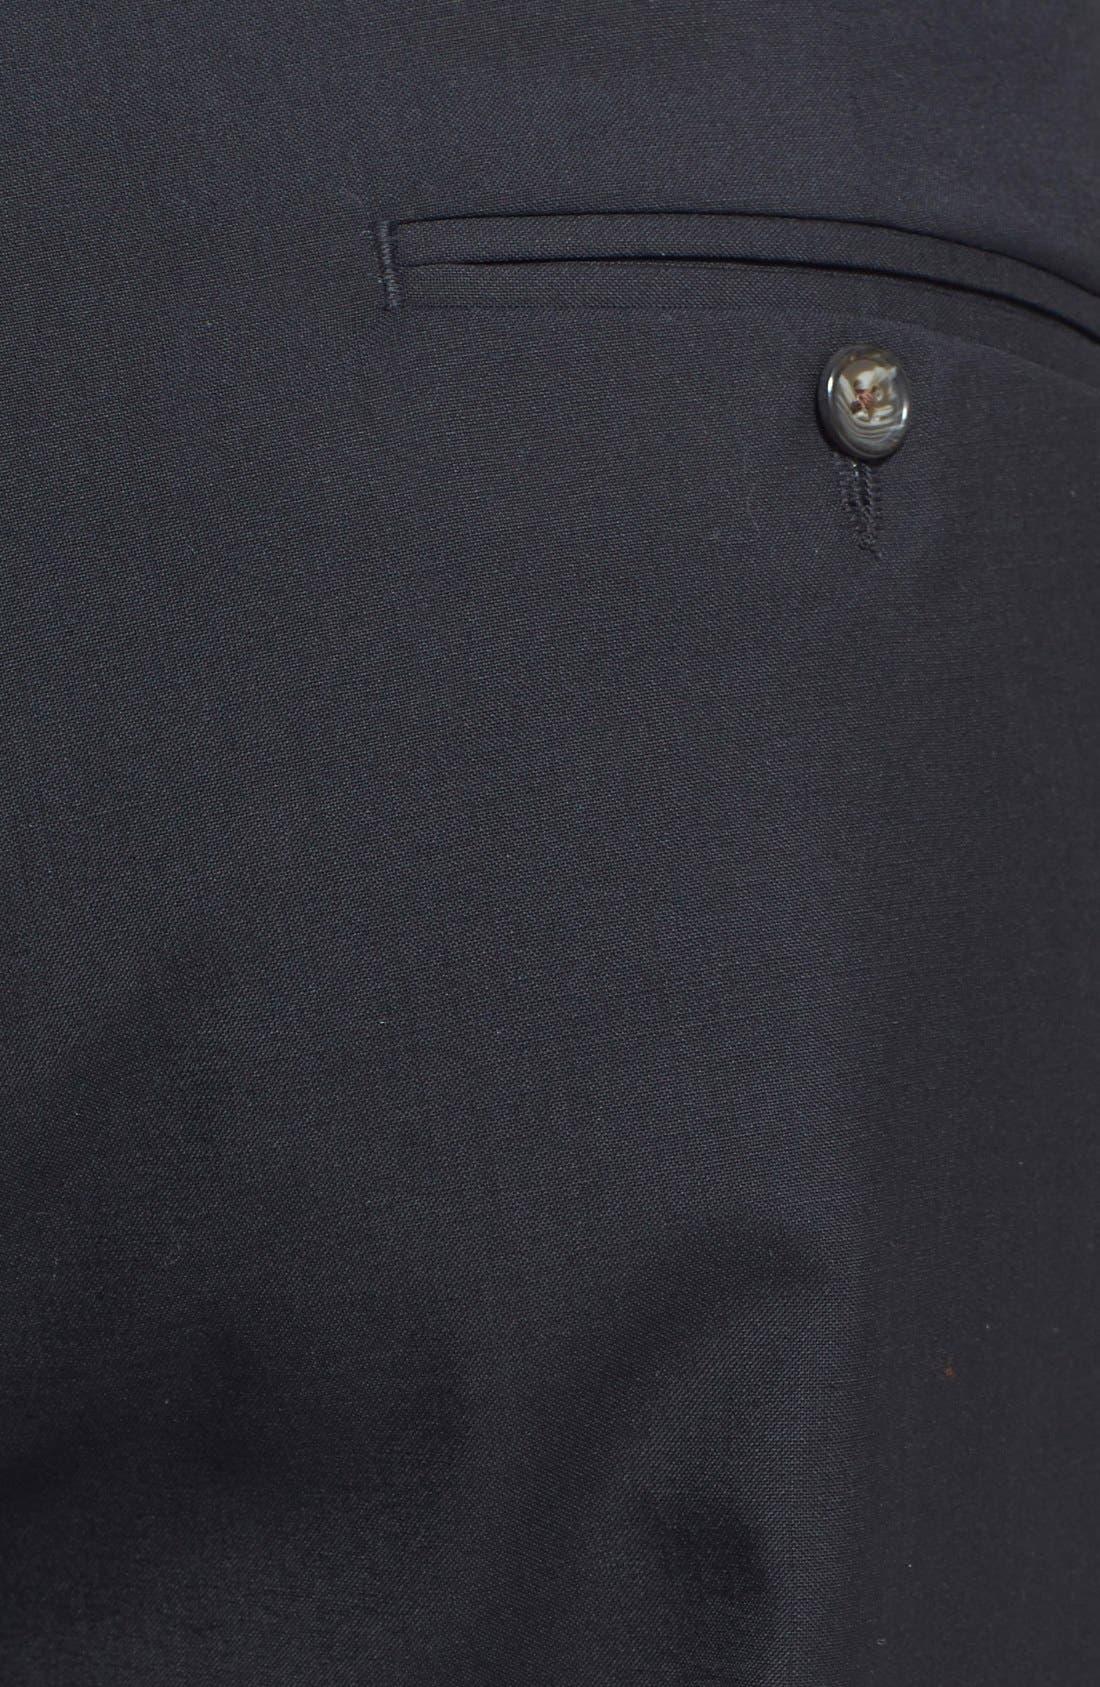 BERLE, Self Sizer Waist Pleated Trousers, Alternate thumbnail 2, color, BLACK